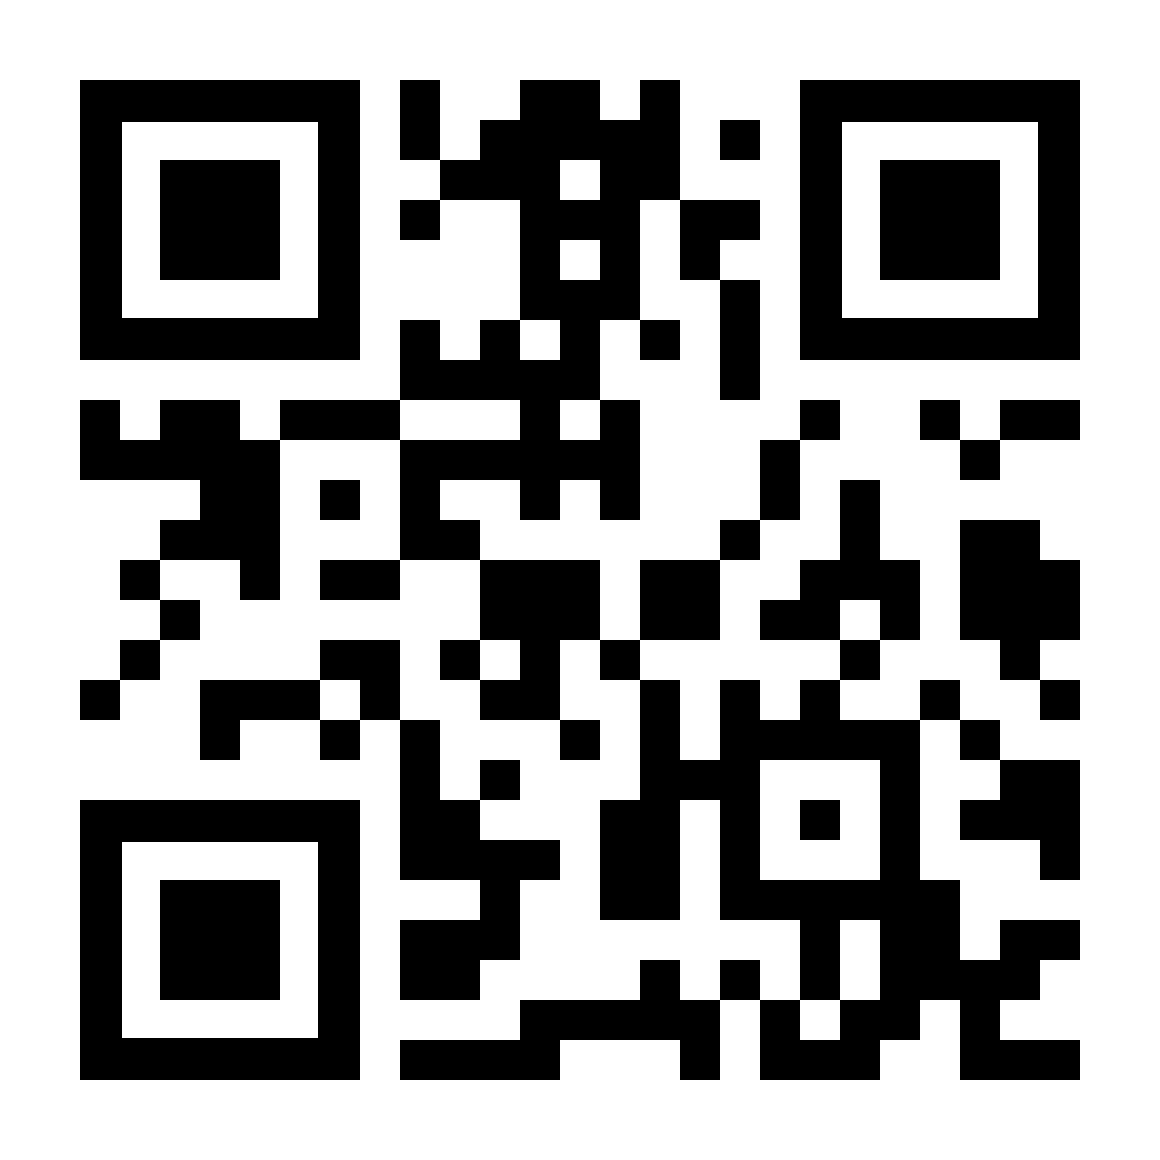 qr-code-mobil30.png